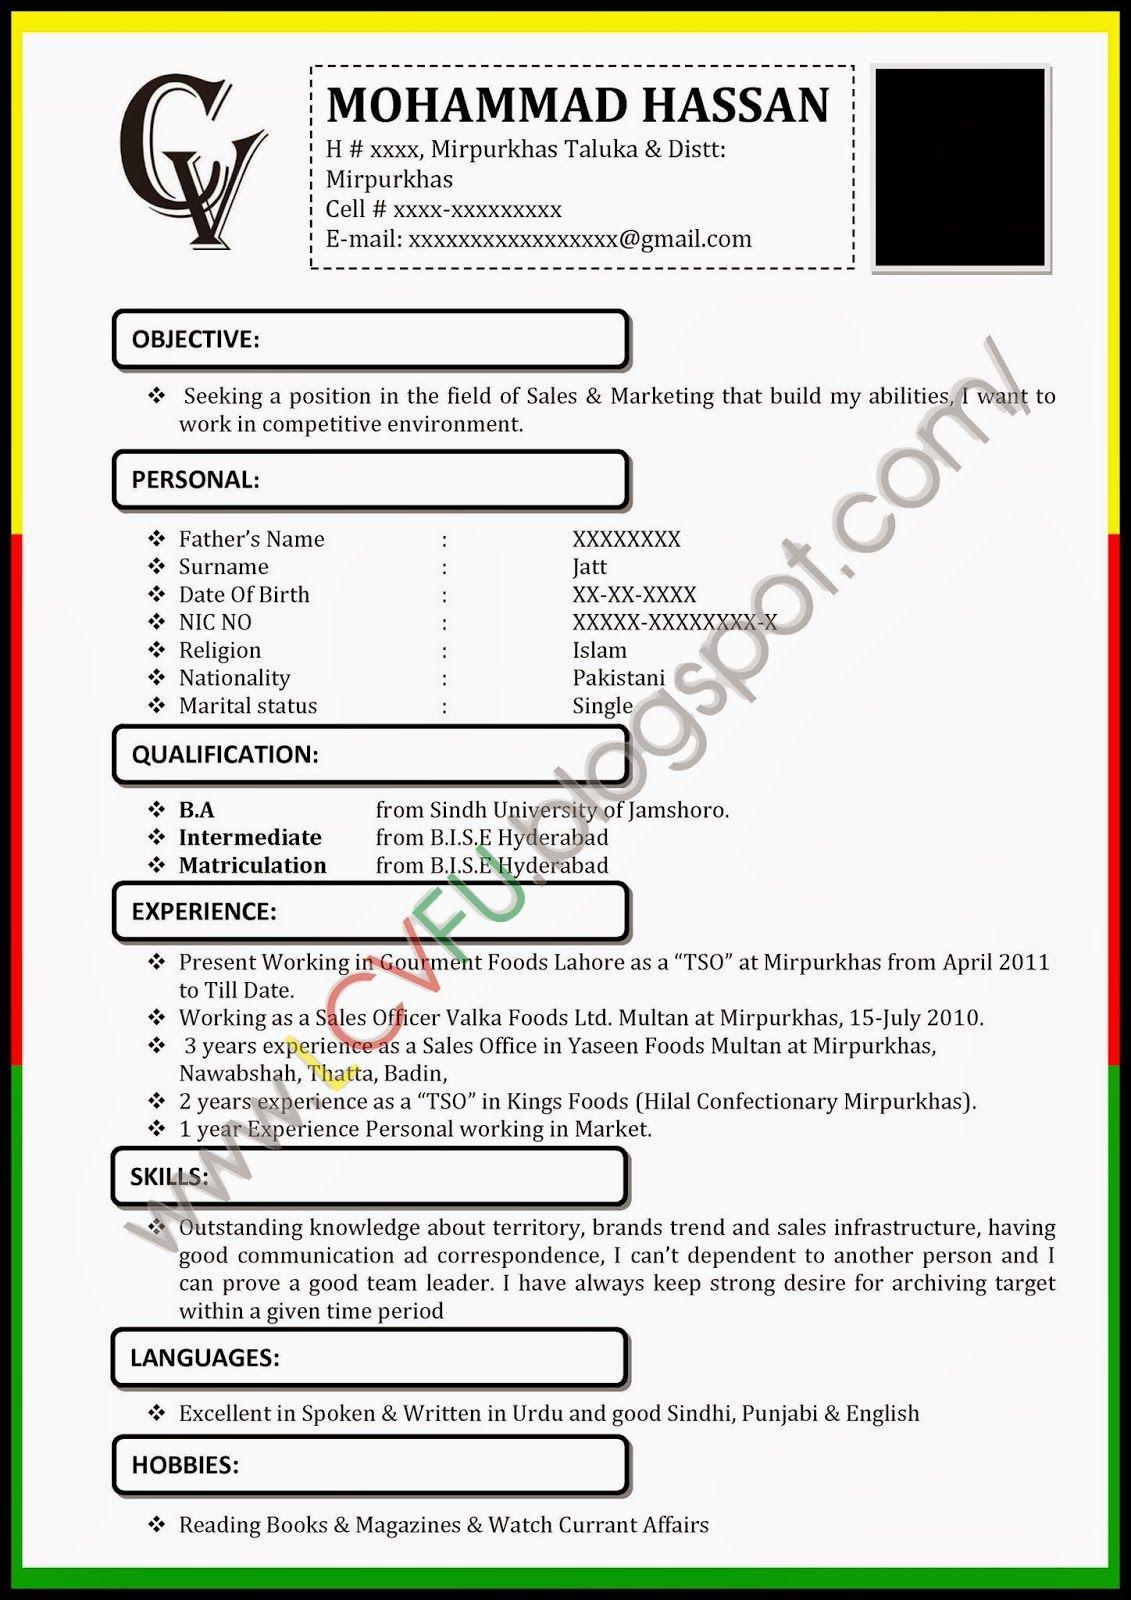 curriculum vitae new zealand format - Cv Or Resume In New Zealand